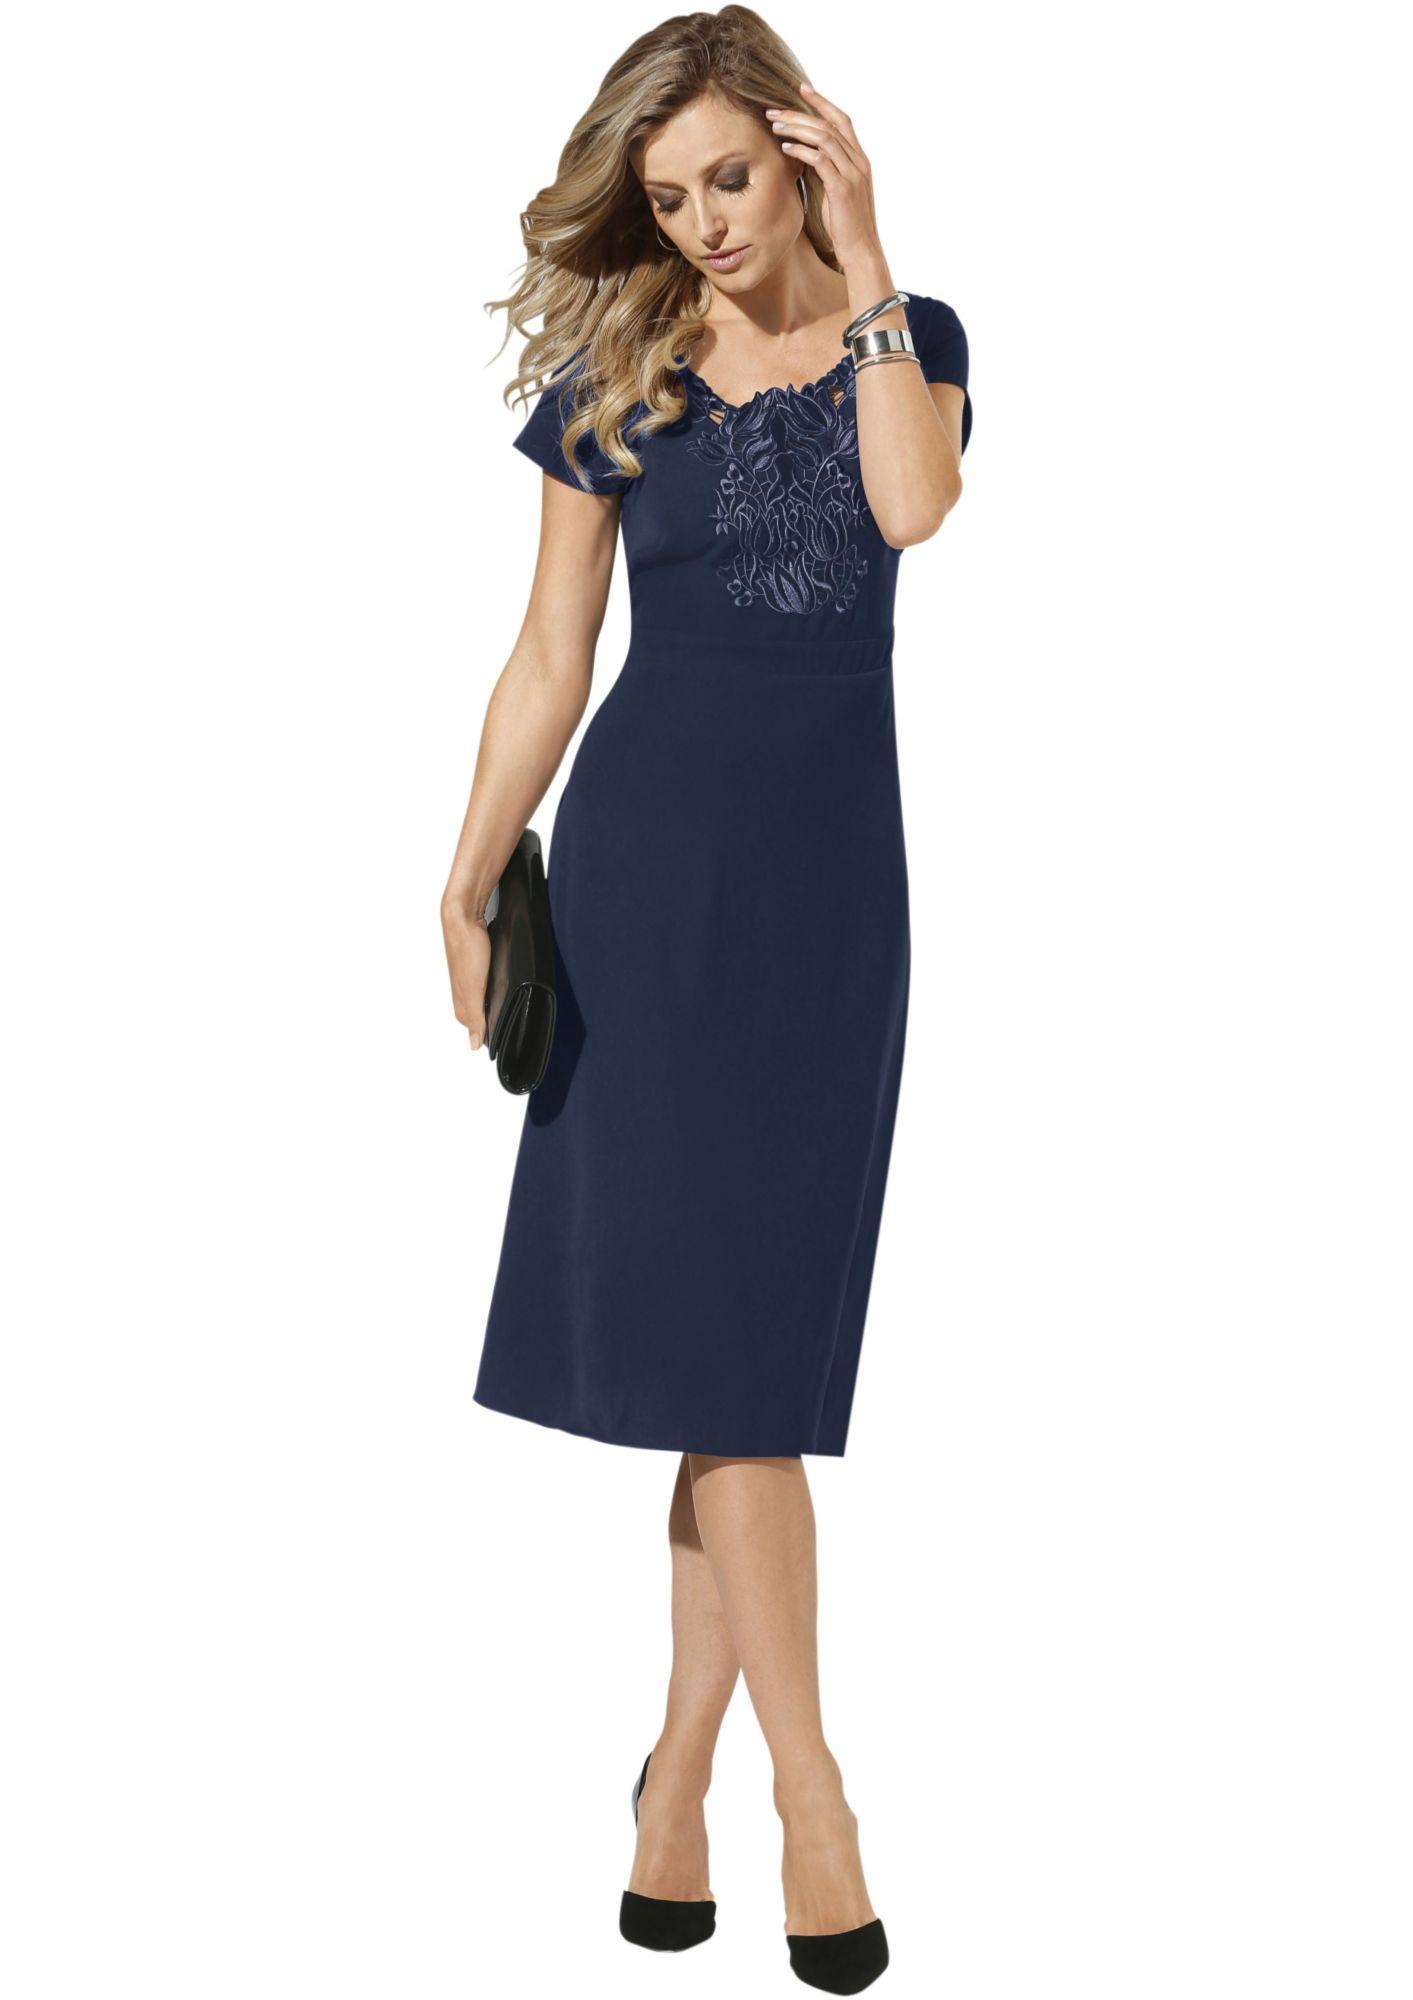 FAIR LADY Fair Lady Kleid in schwingender A-Silhouette